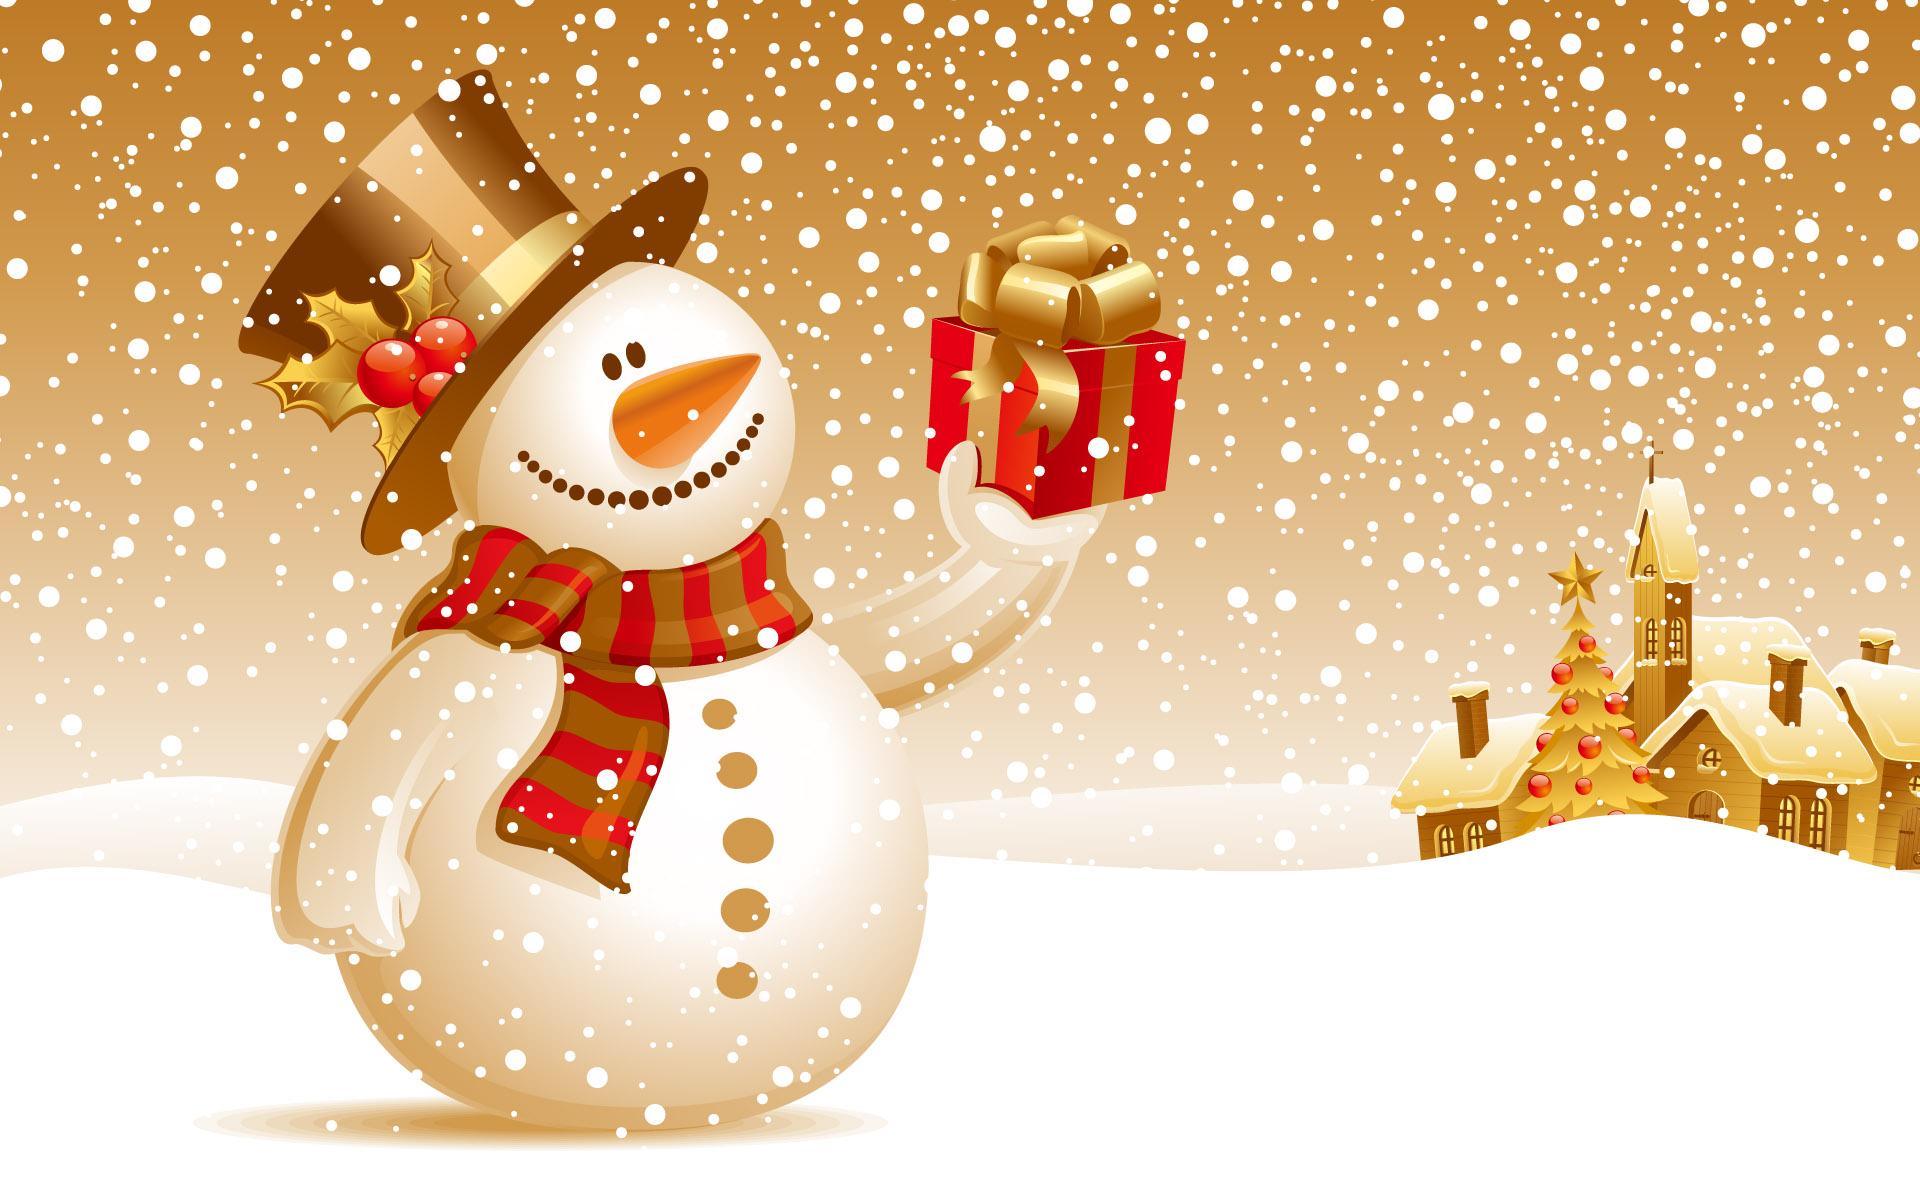 HD Wallpapers Snowman Christmas Gift